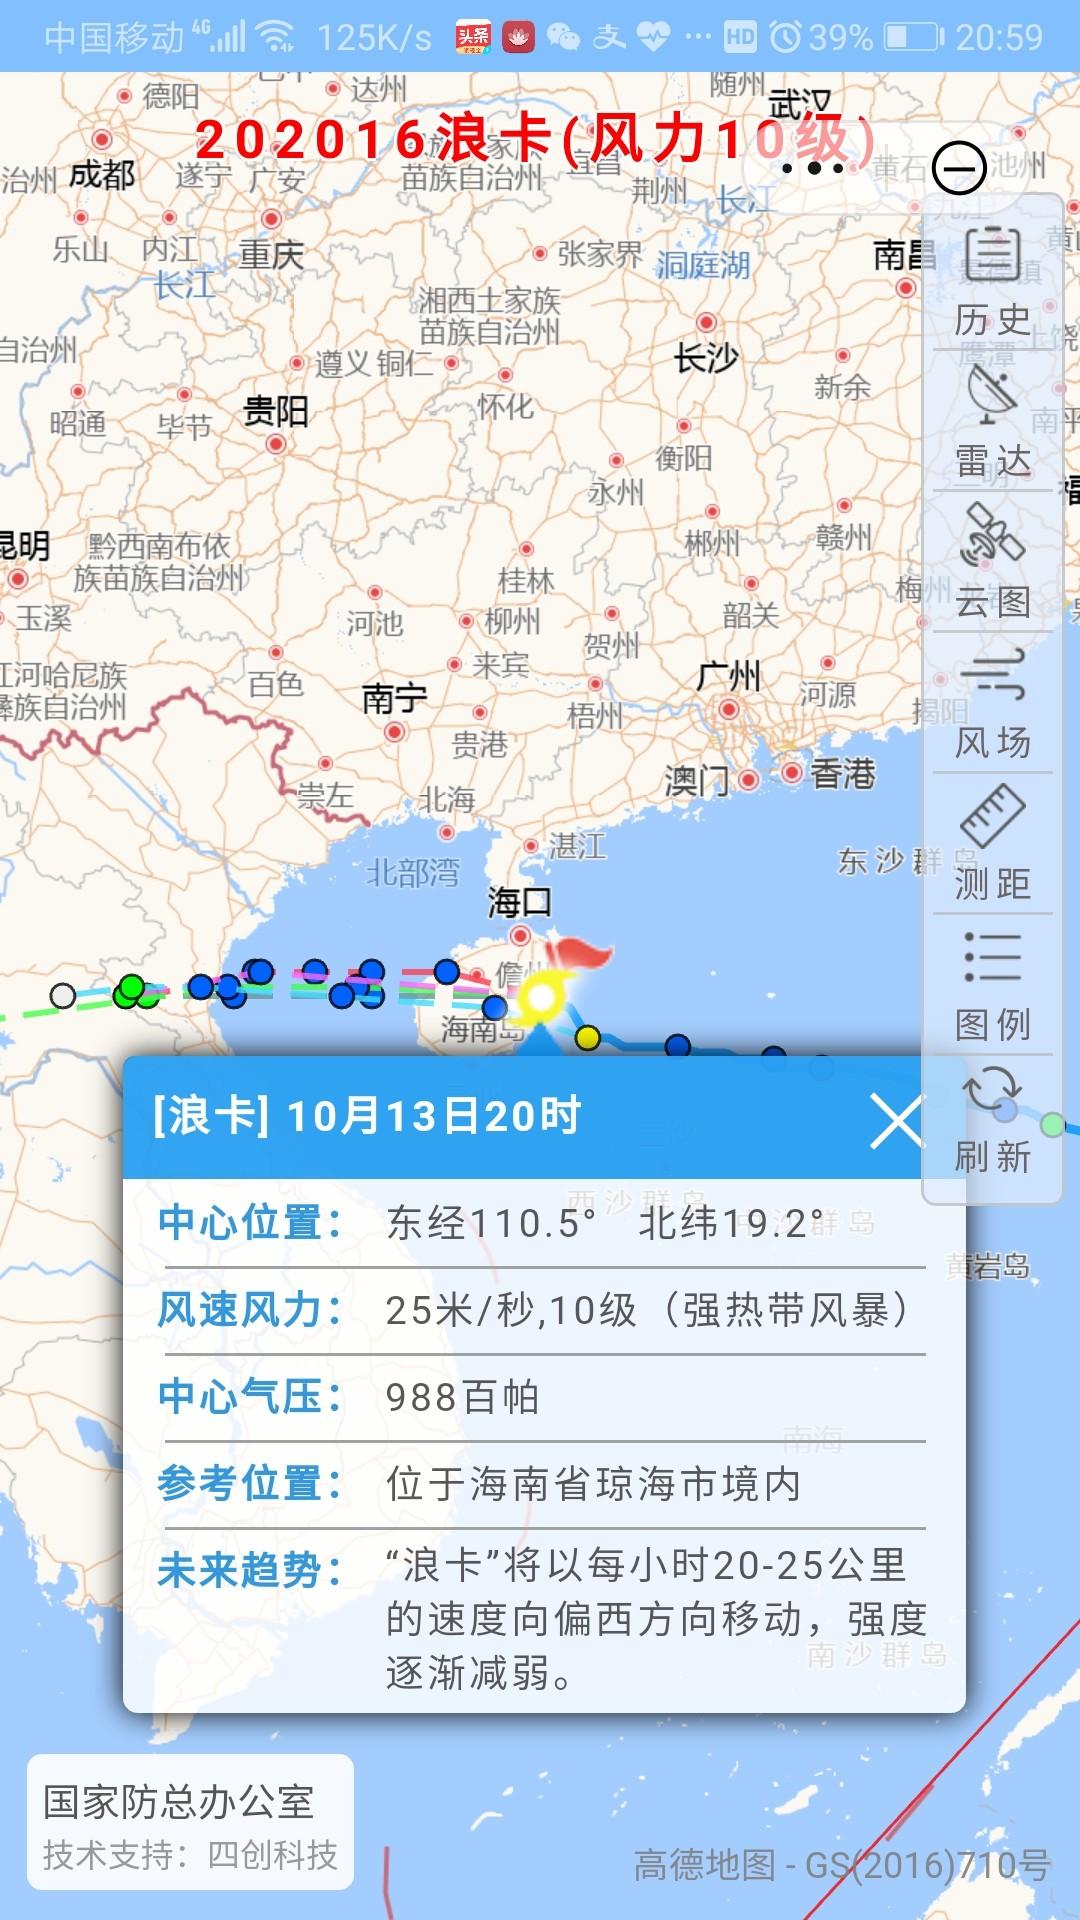 Screenshot_20201013_205959_com.huawei.fastapp.jpg